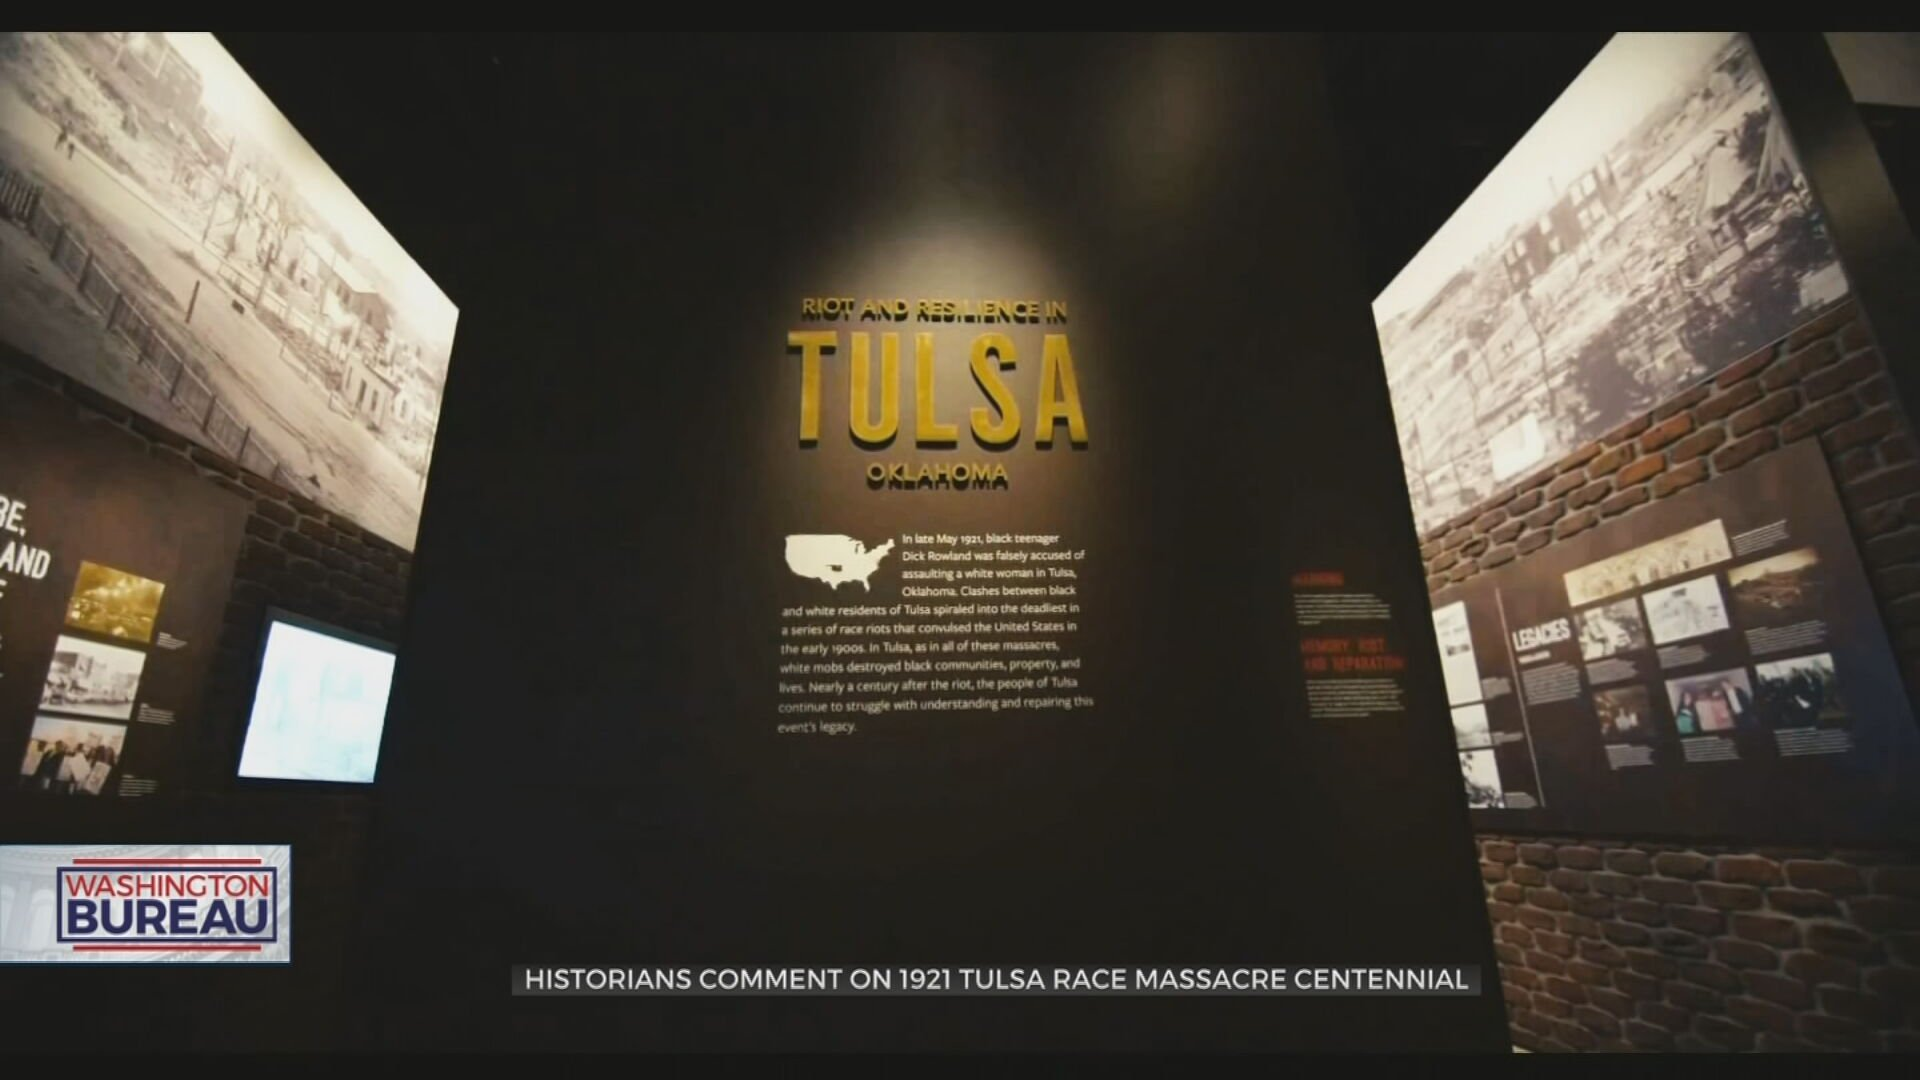 Historians On The Tulsa Race Massacre Centennial: 'We Can't Avoid This History'